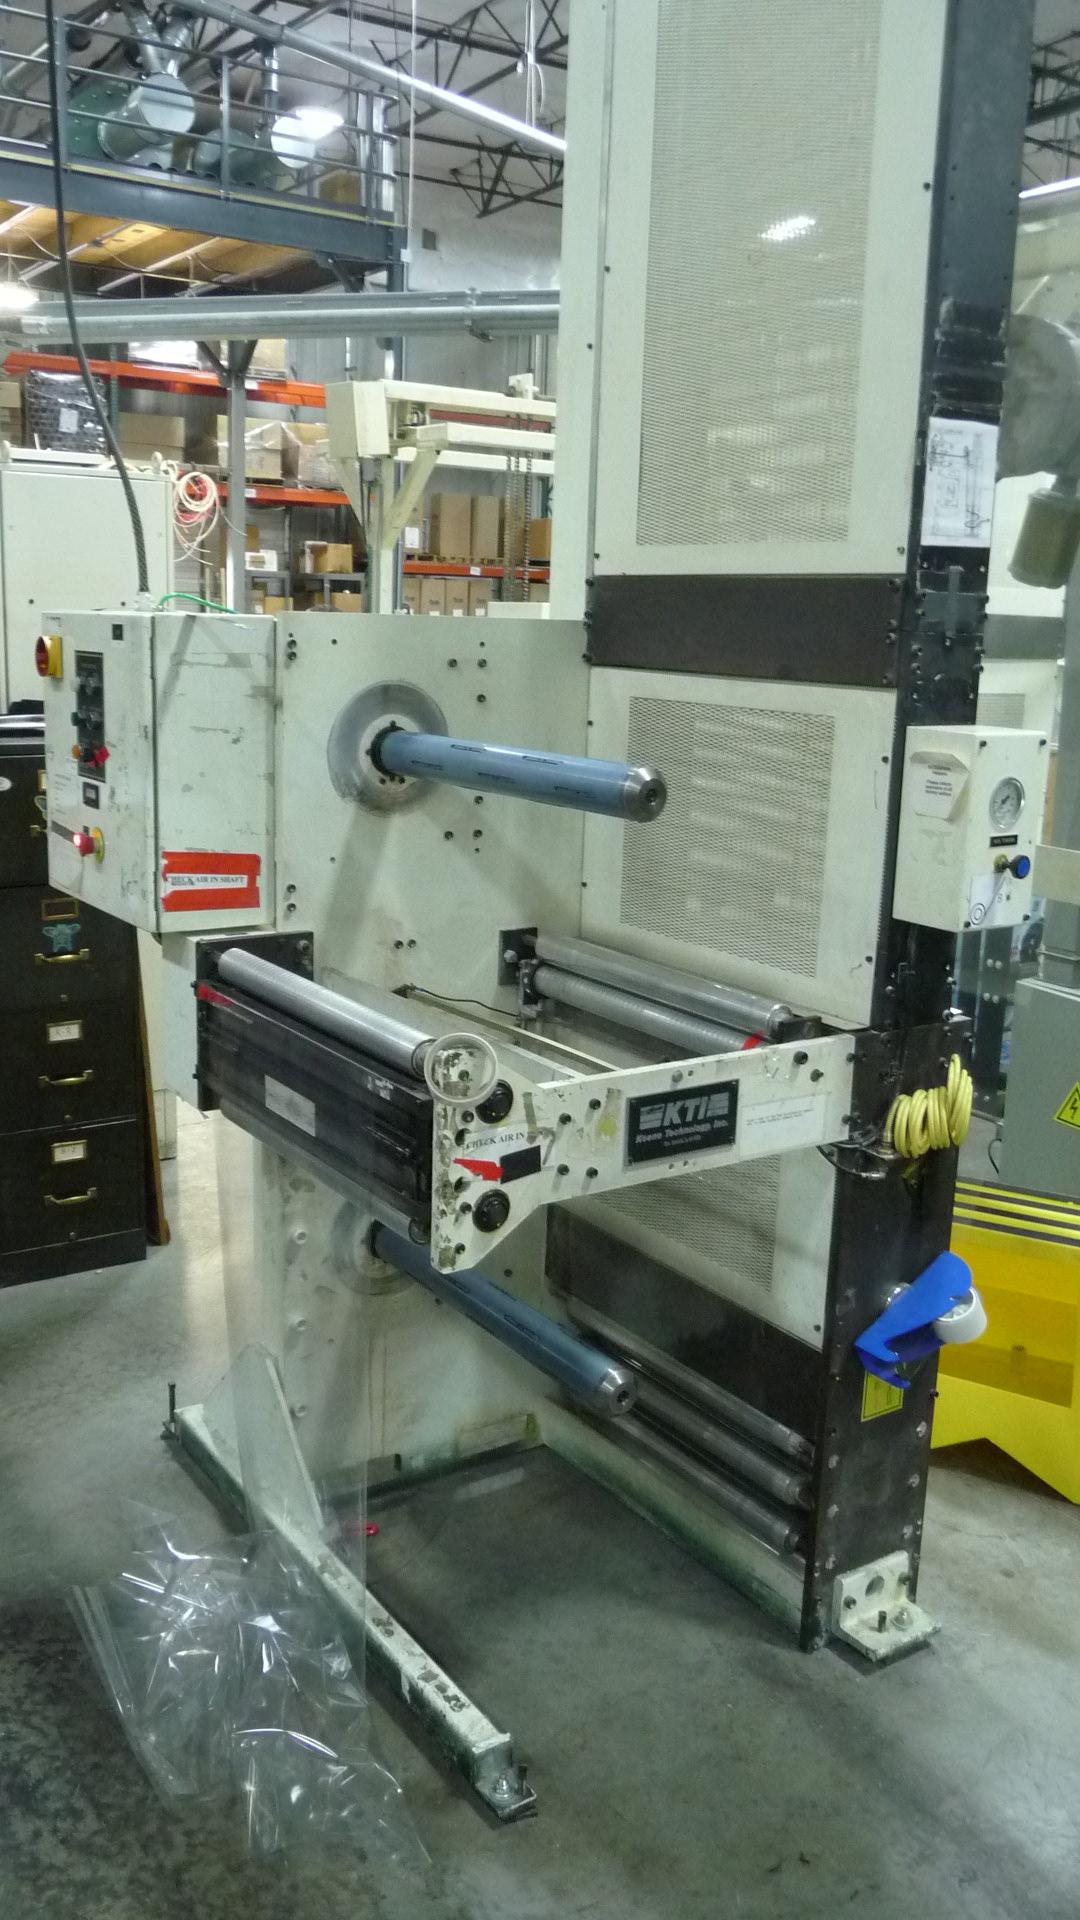 Comco Proglide MSP - Used Flexo Printing Presses and Used Flexographic Equipment-8